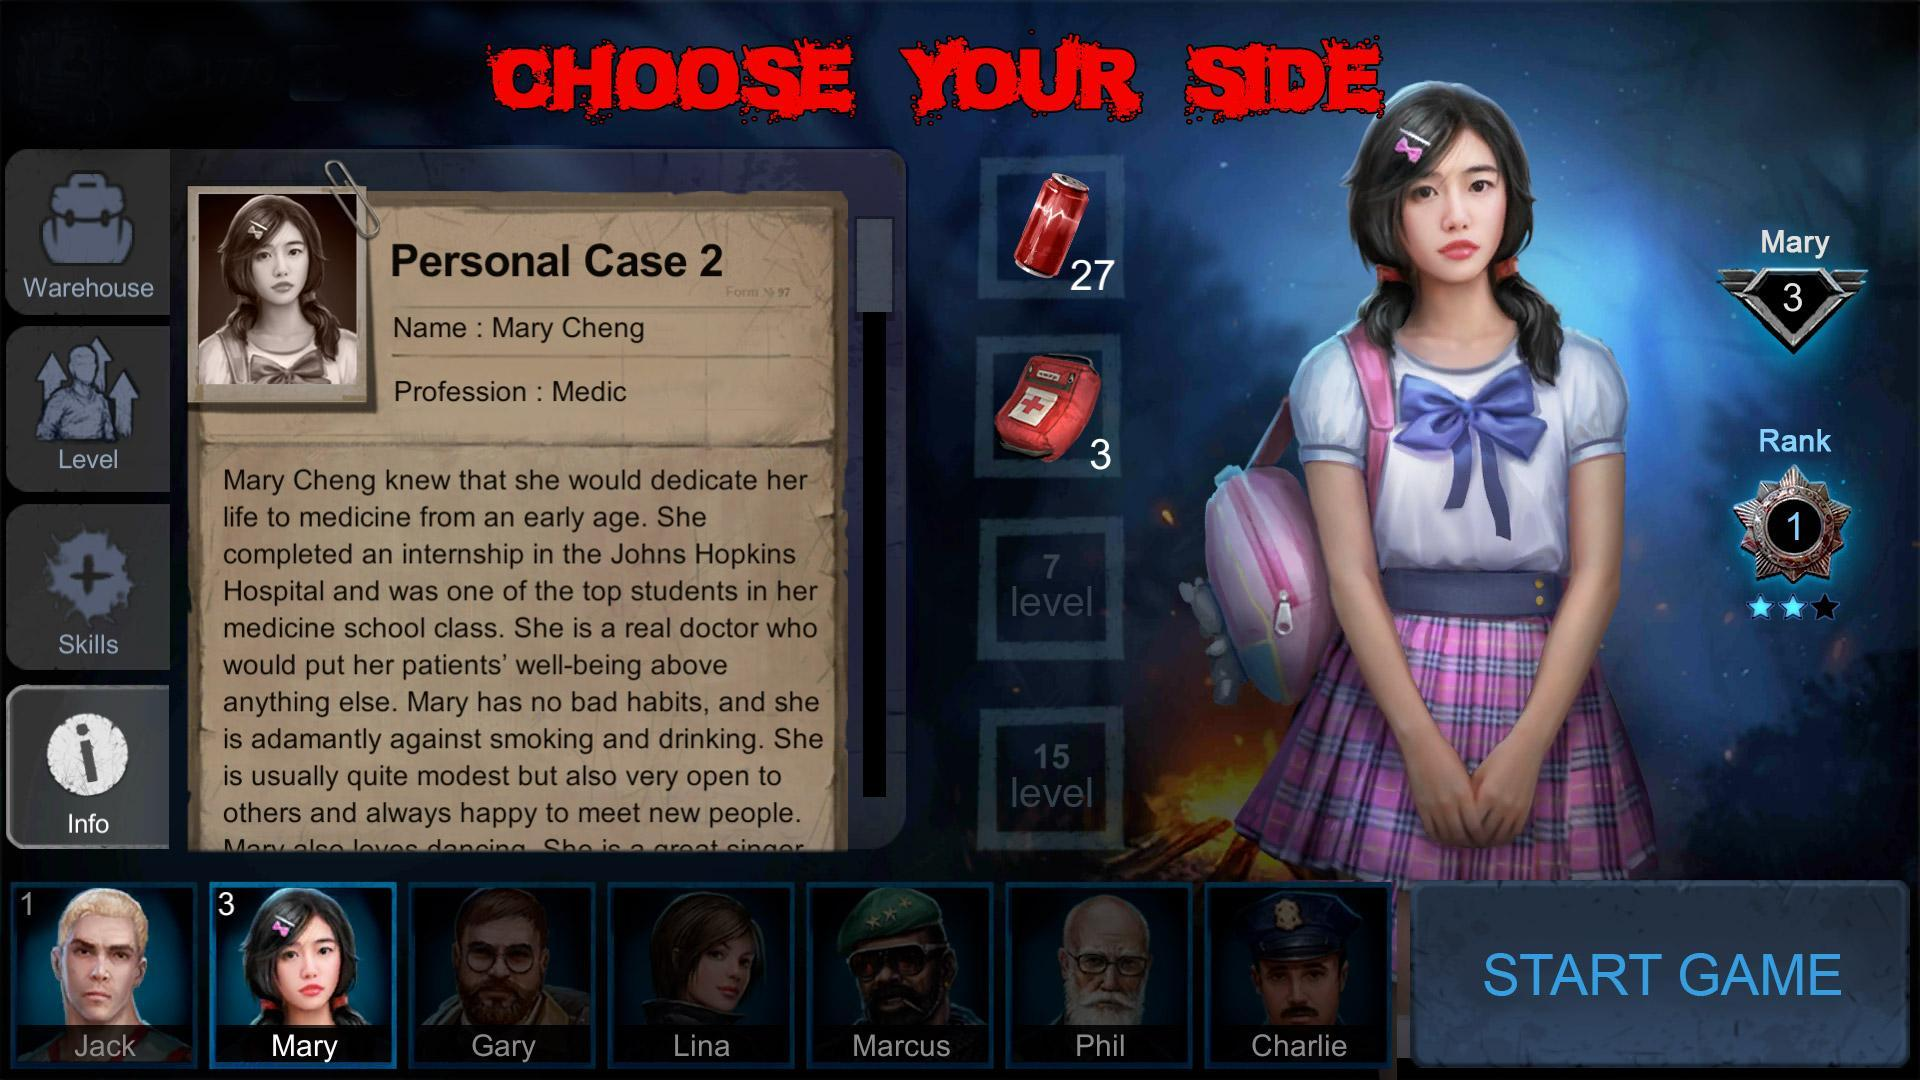 Horrorfield Multiplayer Survival Horror Game 1.3.6 Screenshot 13